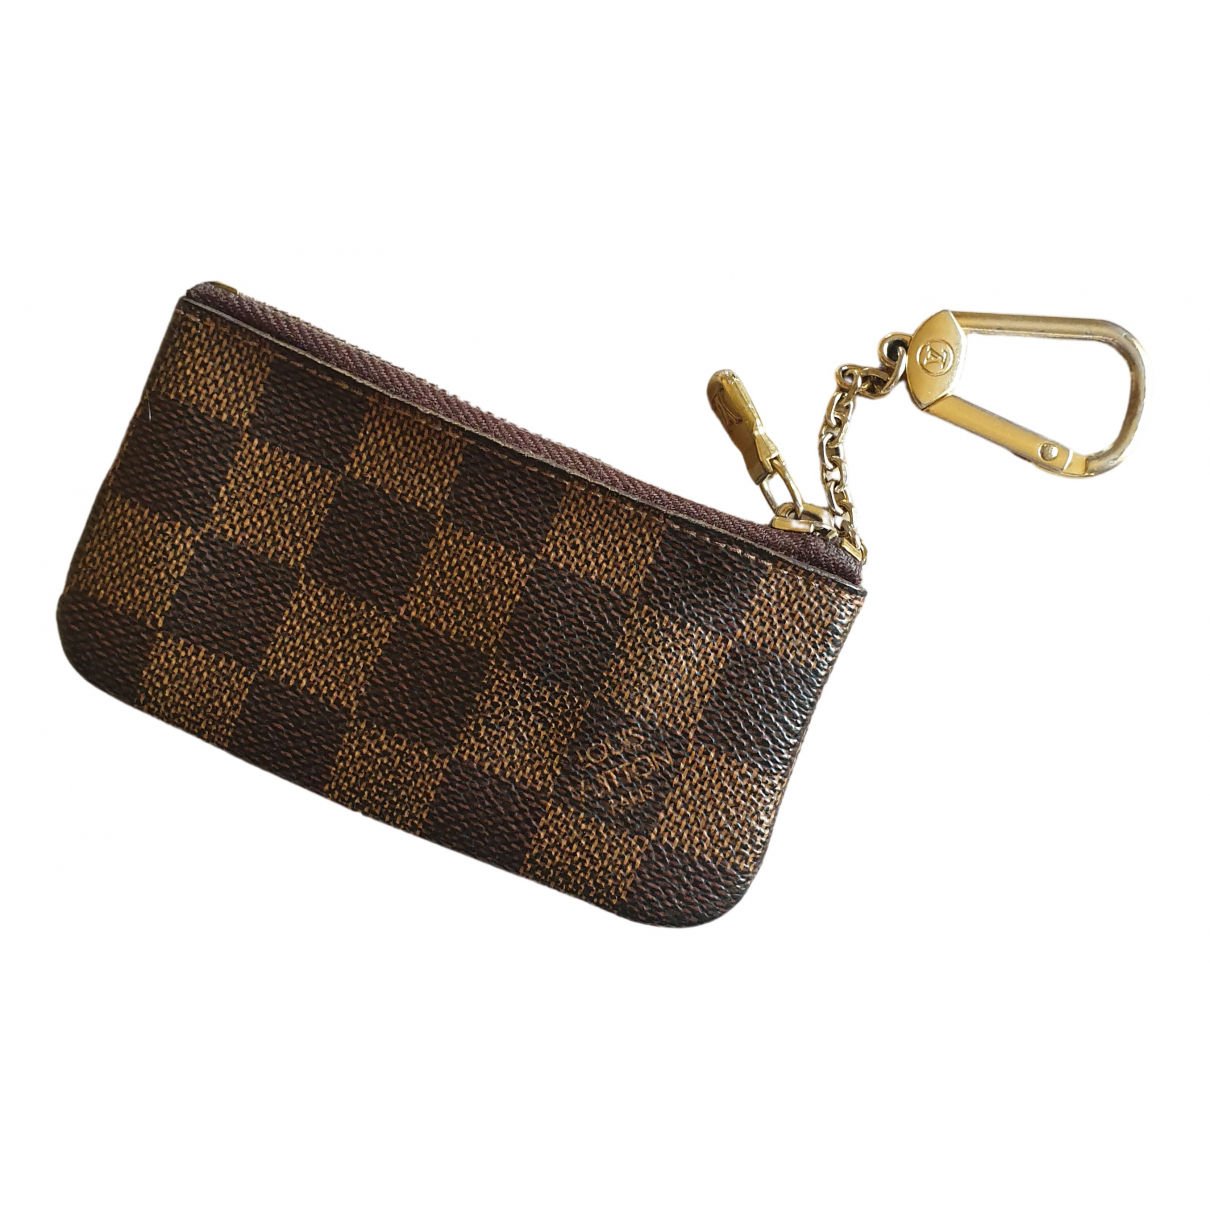 Monedero de Lona Louis Vuitton